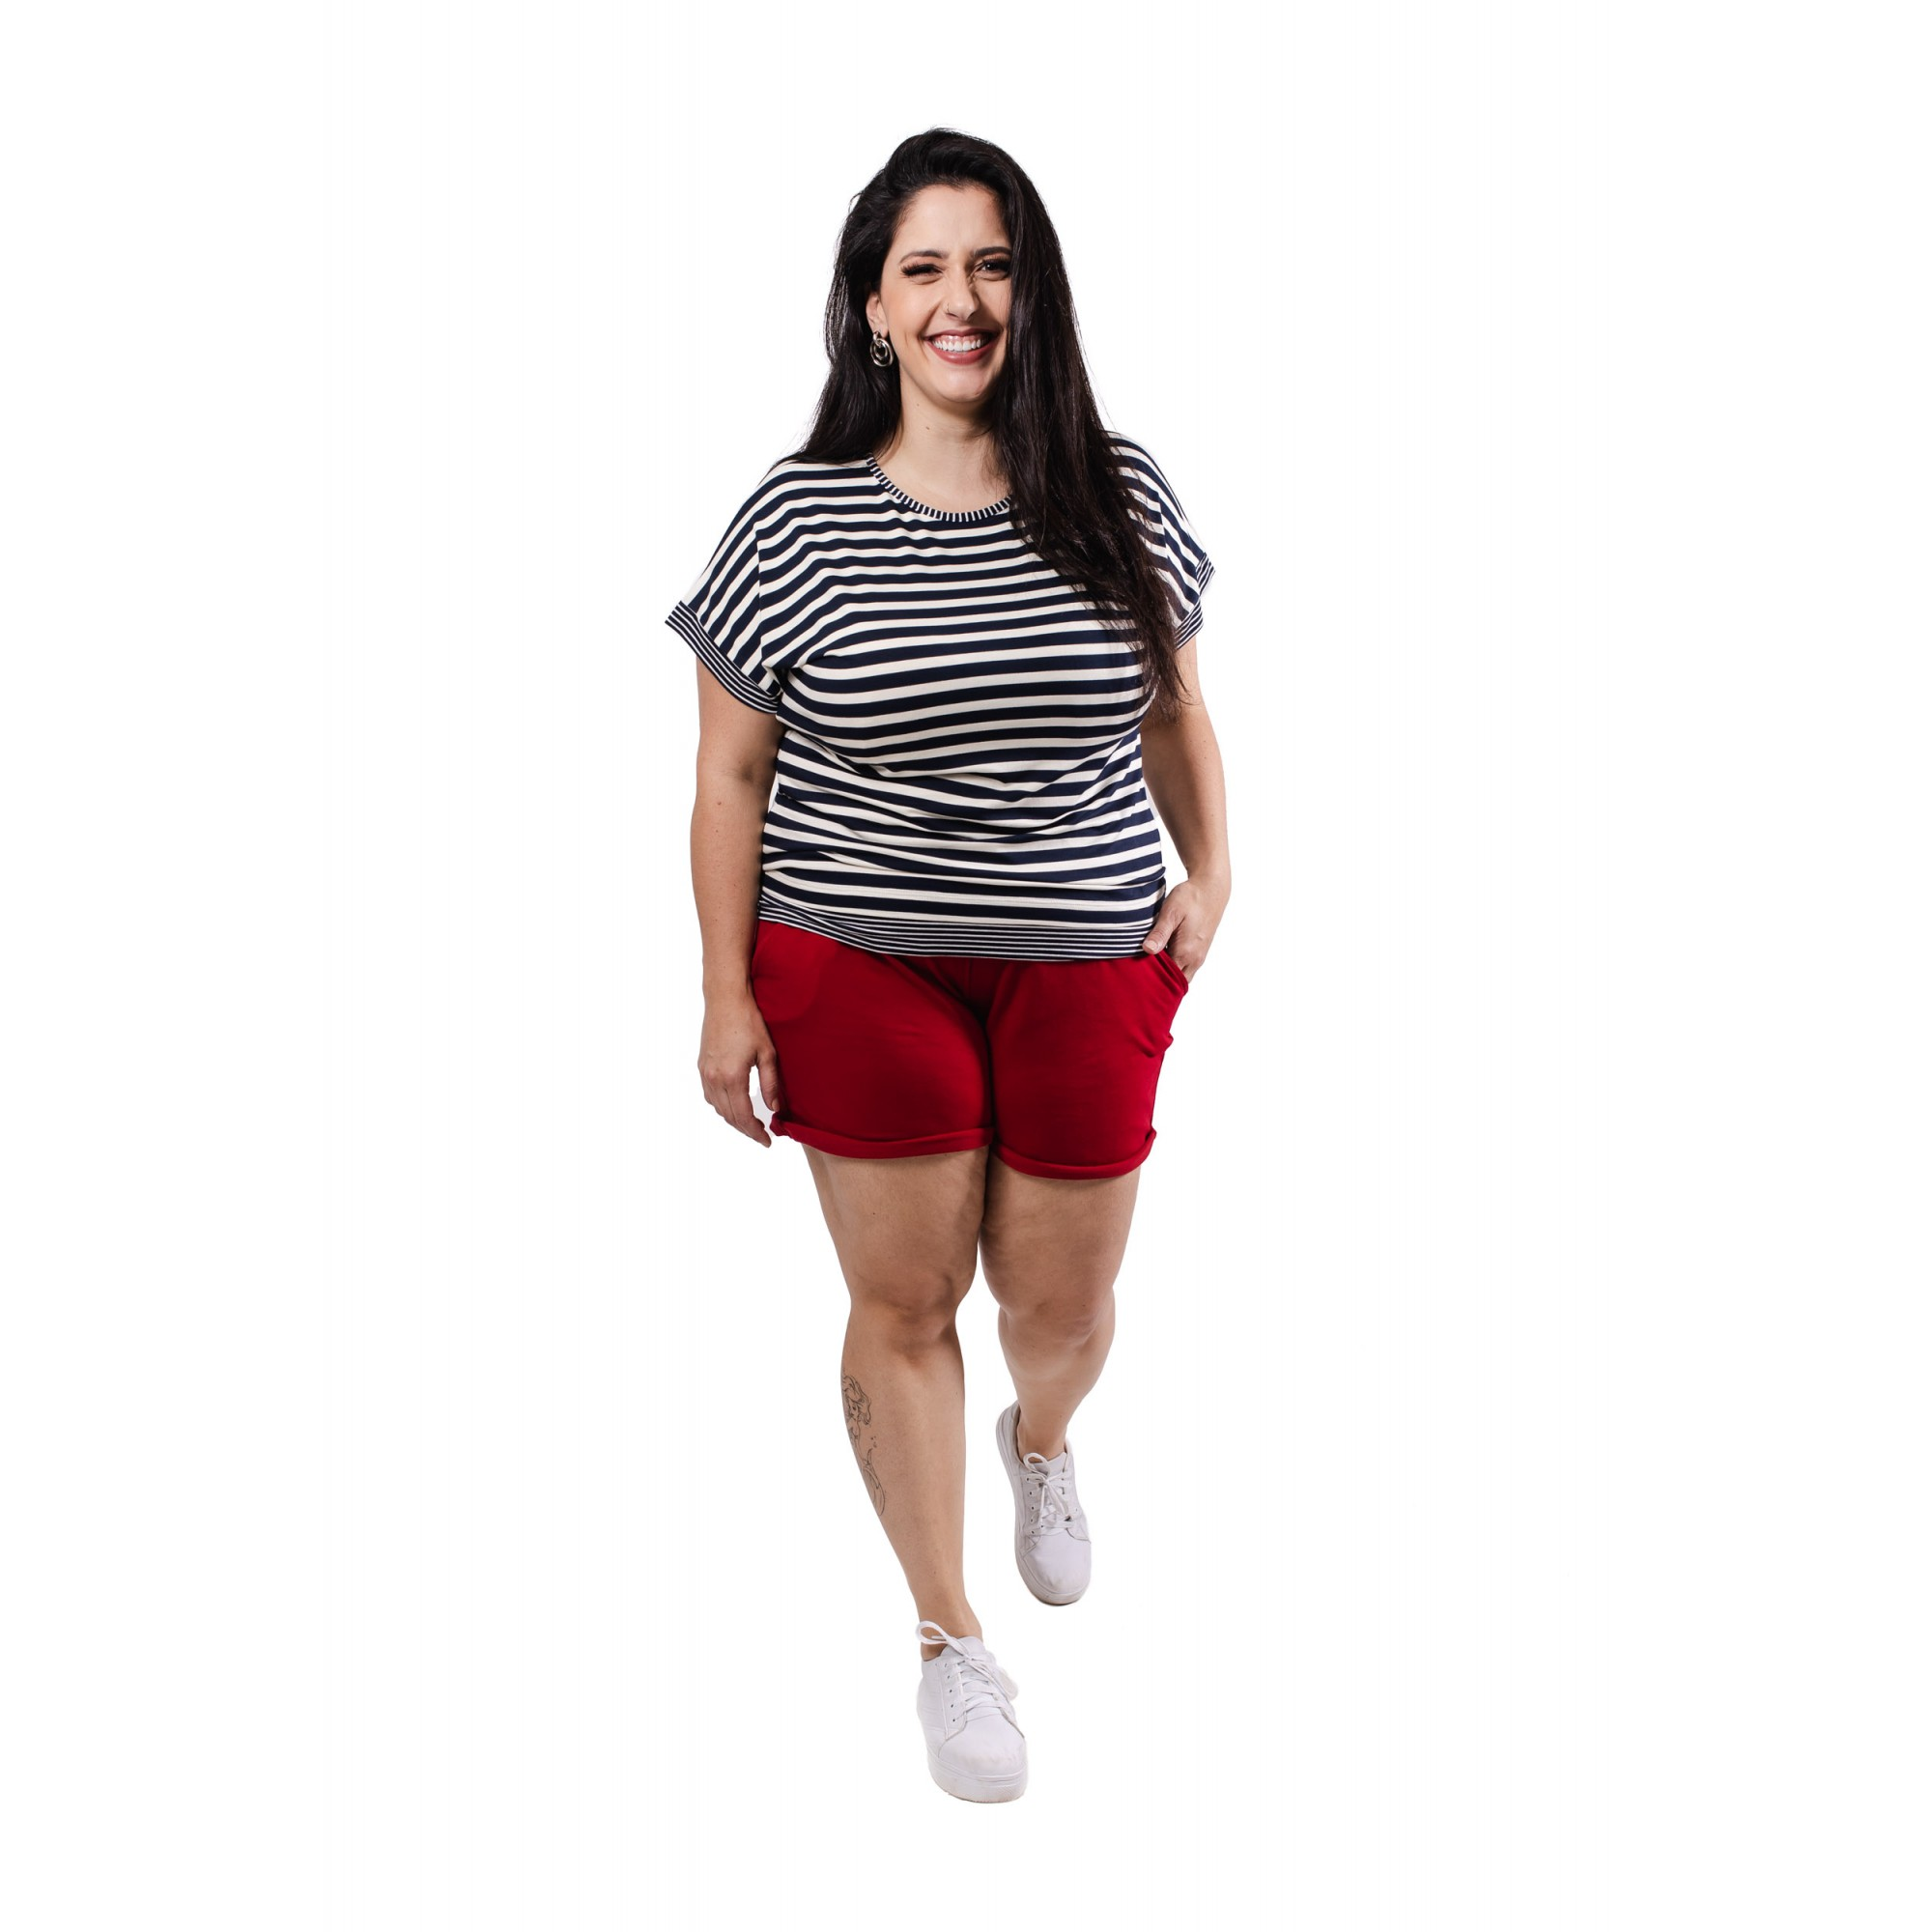 Blusa Feminina Listrada Plus Size